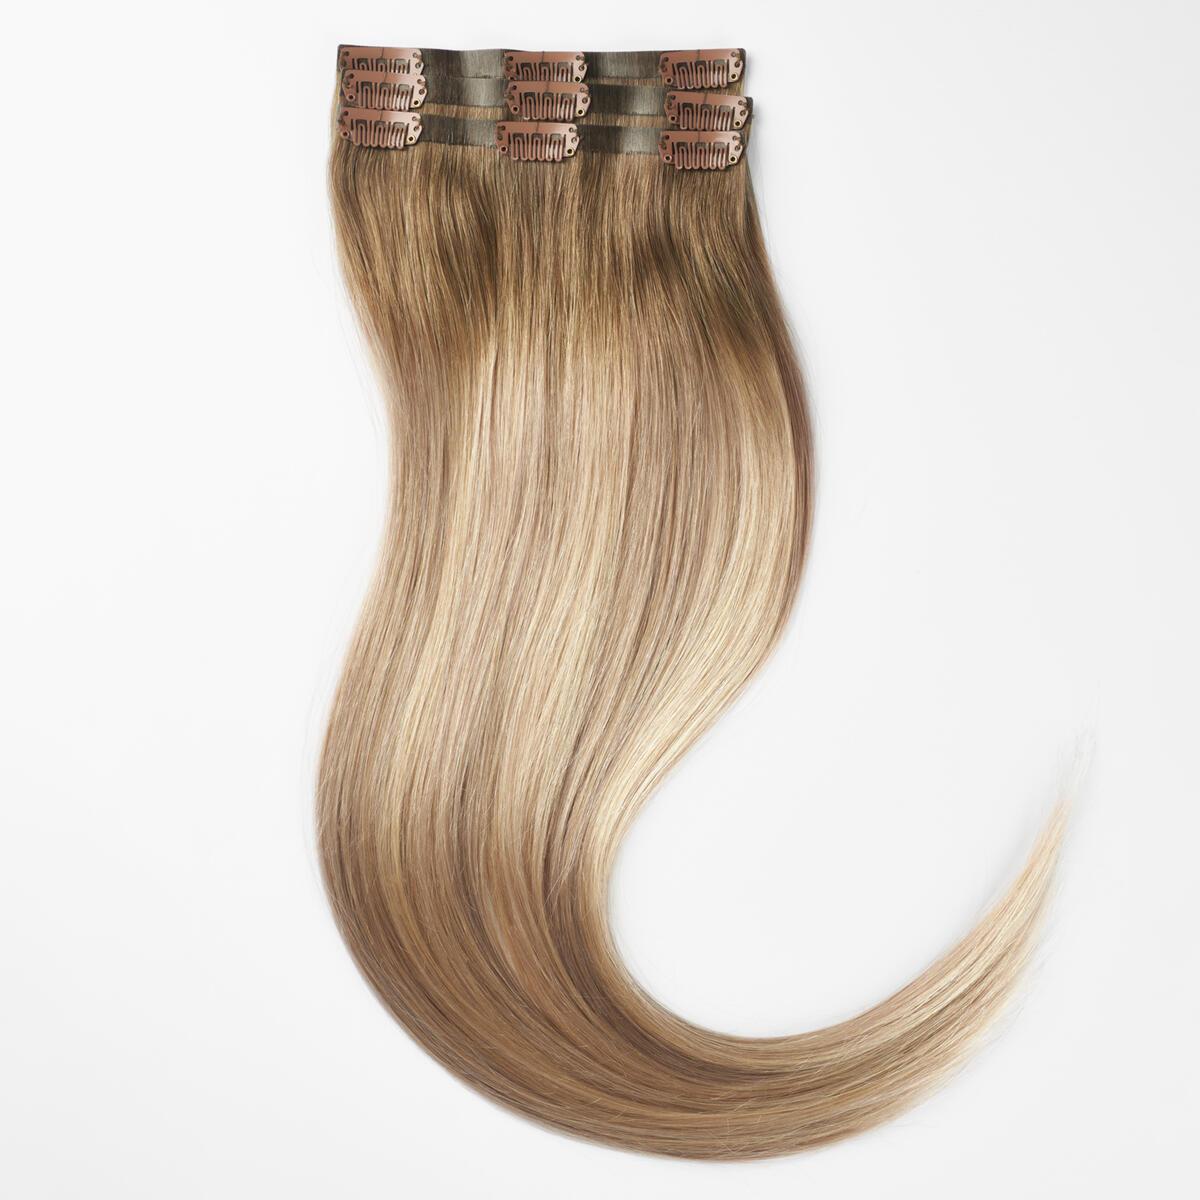 Sleek Clip-on set 3 pieces B2.6/10.7 Dark Ashy Blonde Balayage 50 cm